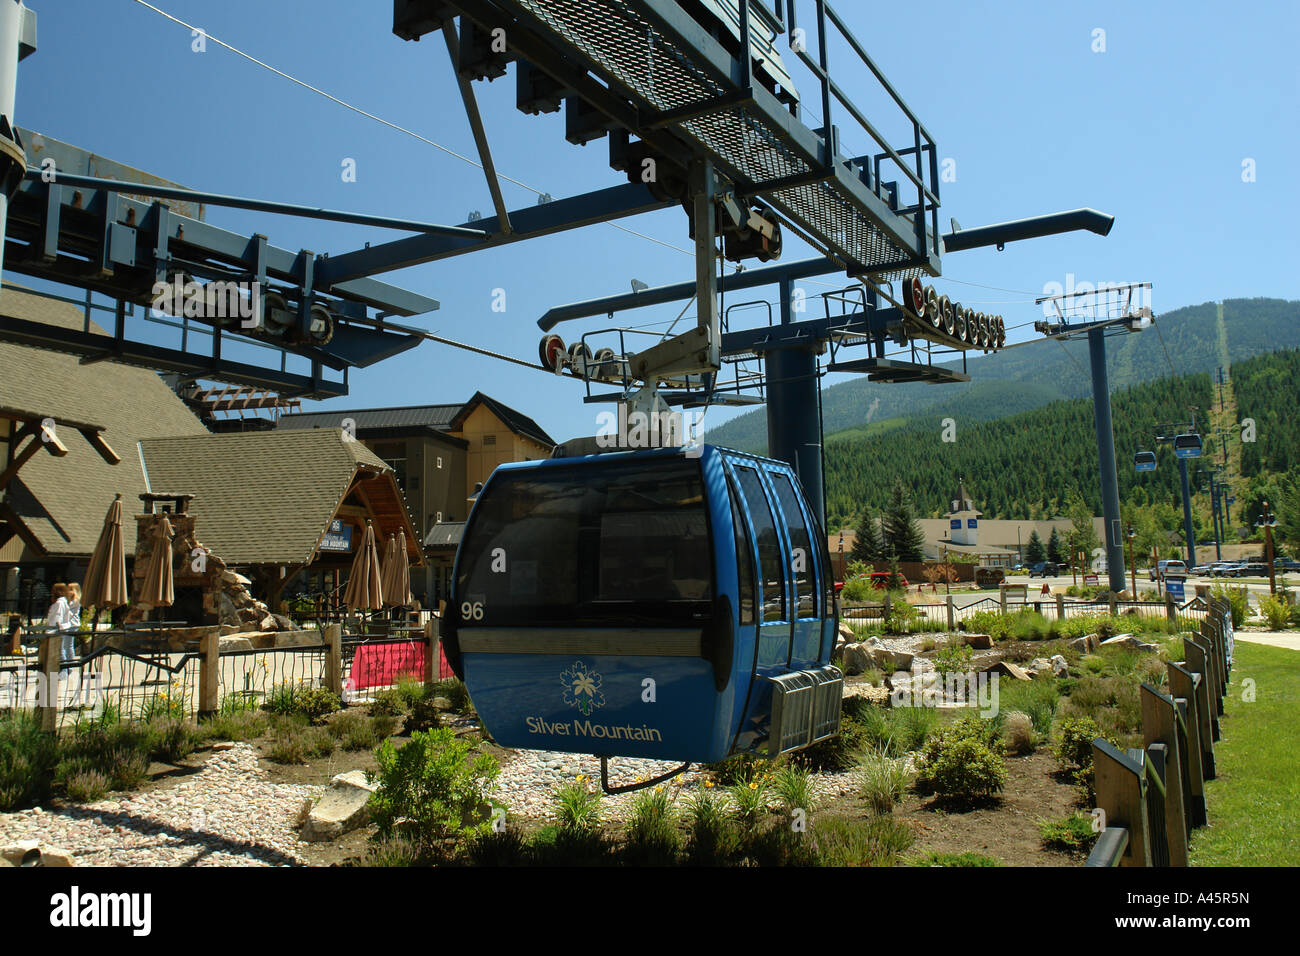 ajd56263, kellogg, id, idaho, silver mountain resort, gondola stock